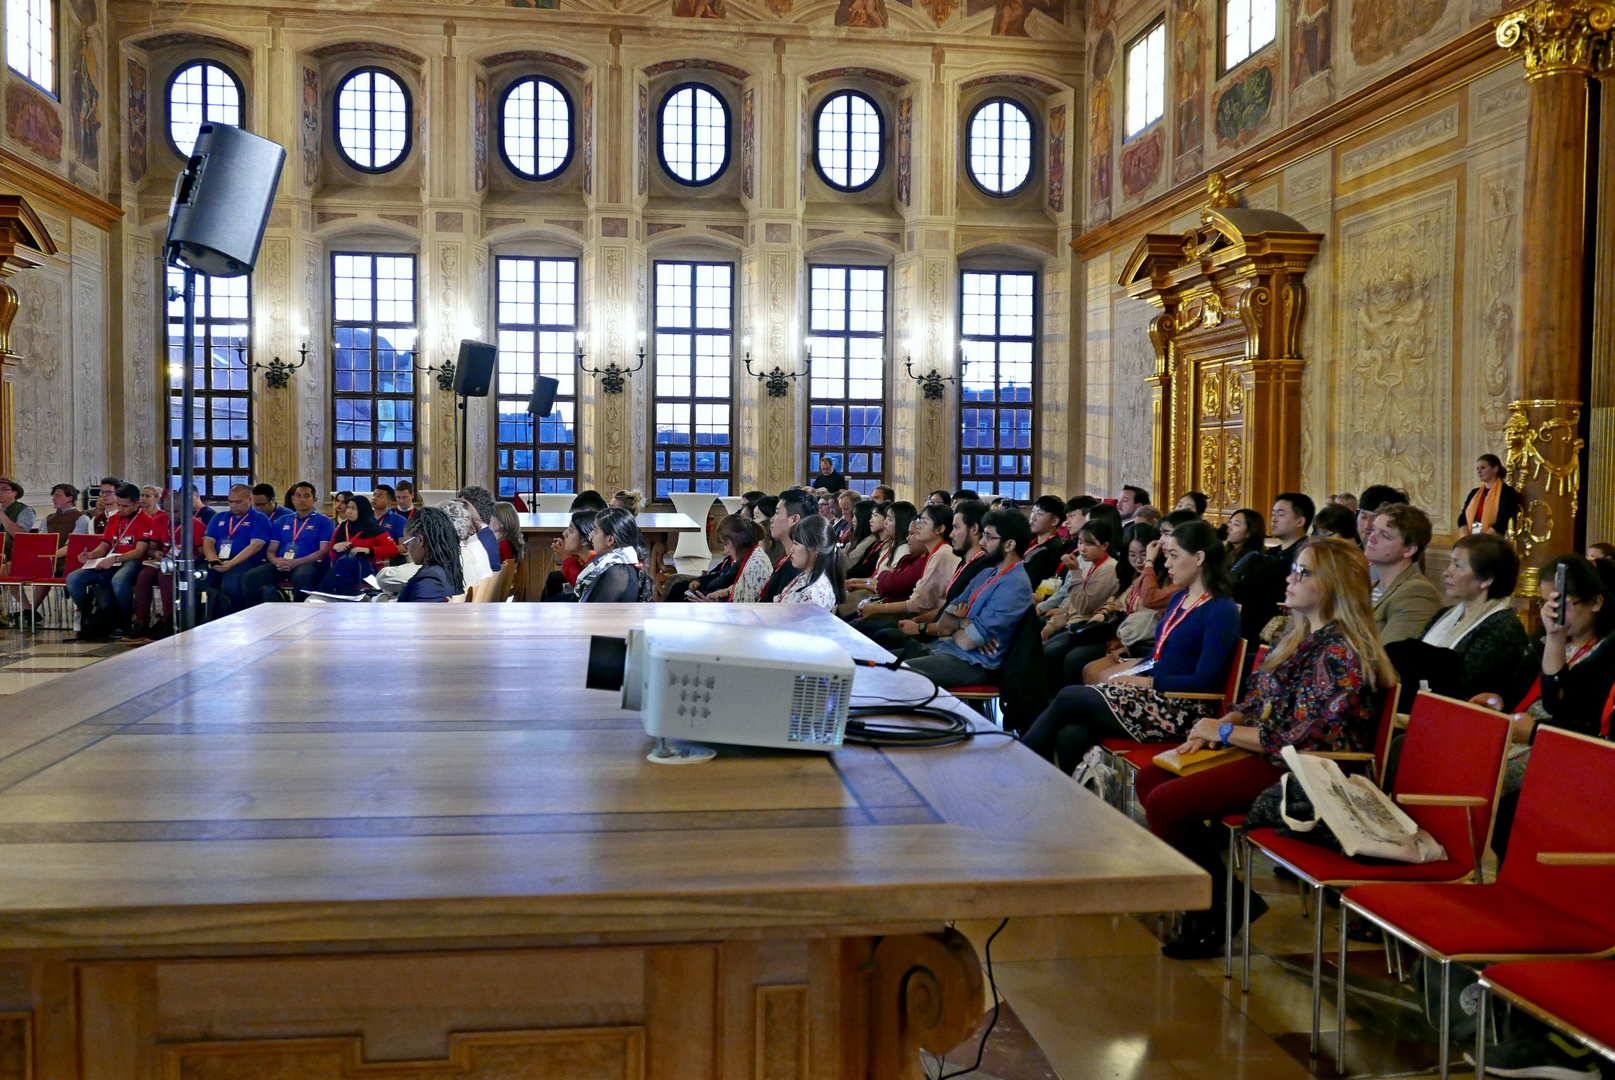 Welt-Jugendfreiwilligenforum 2018 Augsburg / Deutschland - 15.10.2018 Rathaus Goldener Saal Willkommen - Foto: Christoph Urban - Freiwilligen-Zentrum Augsburg